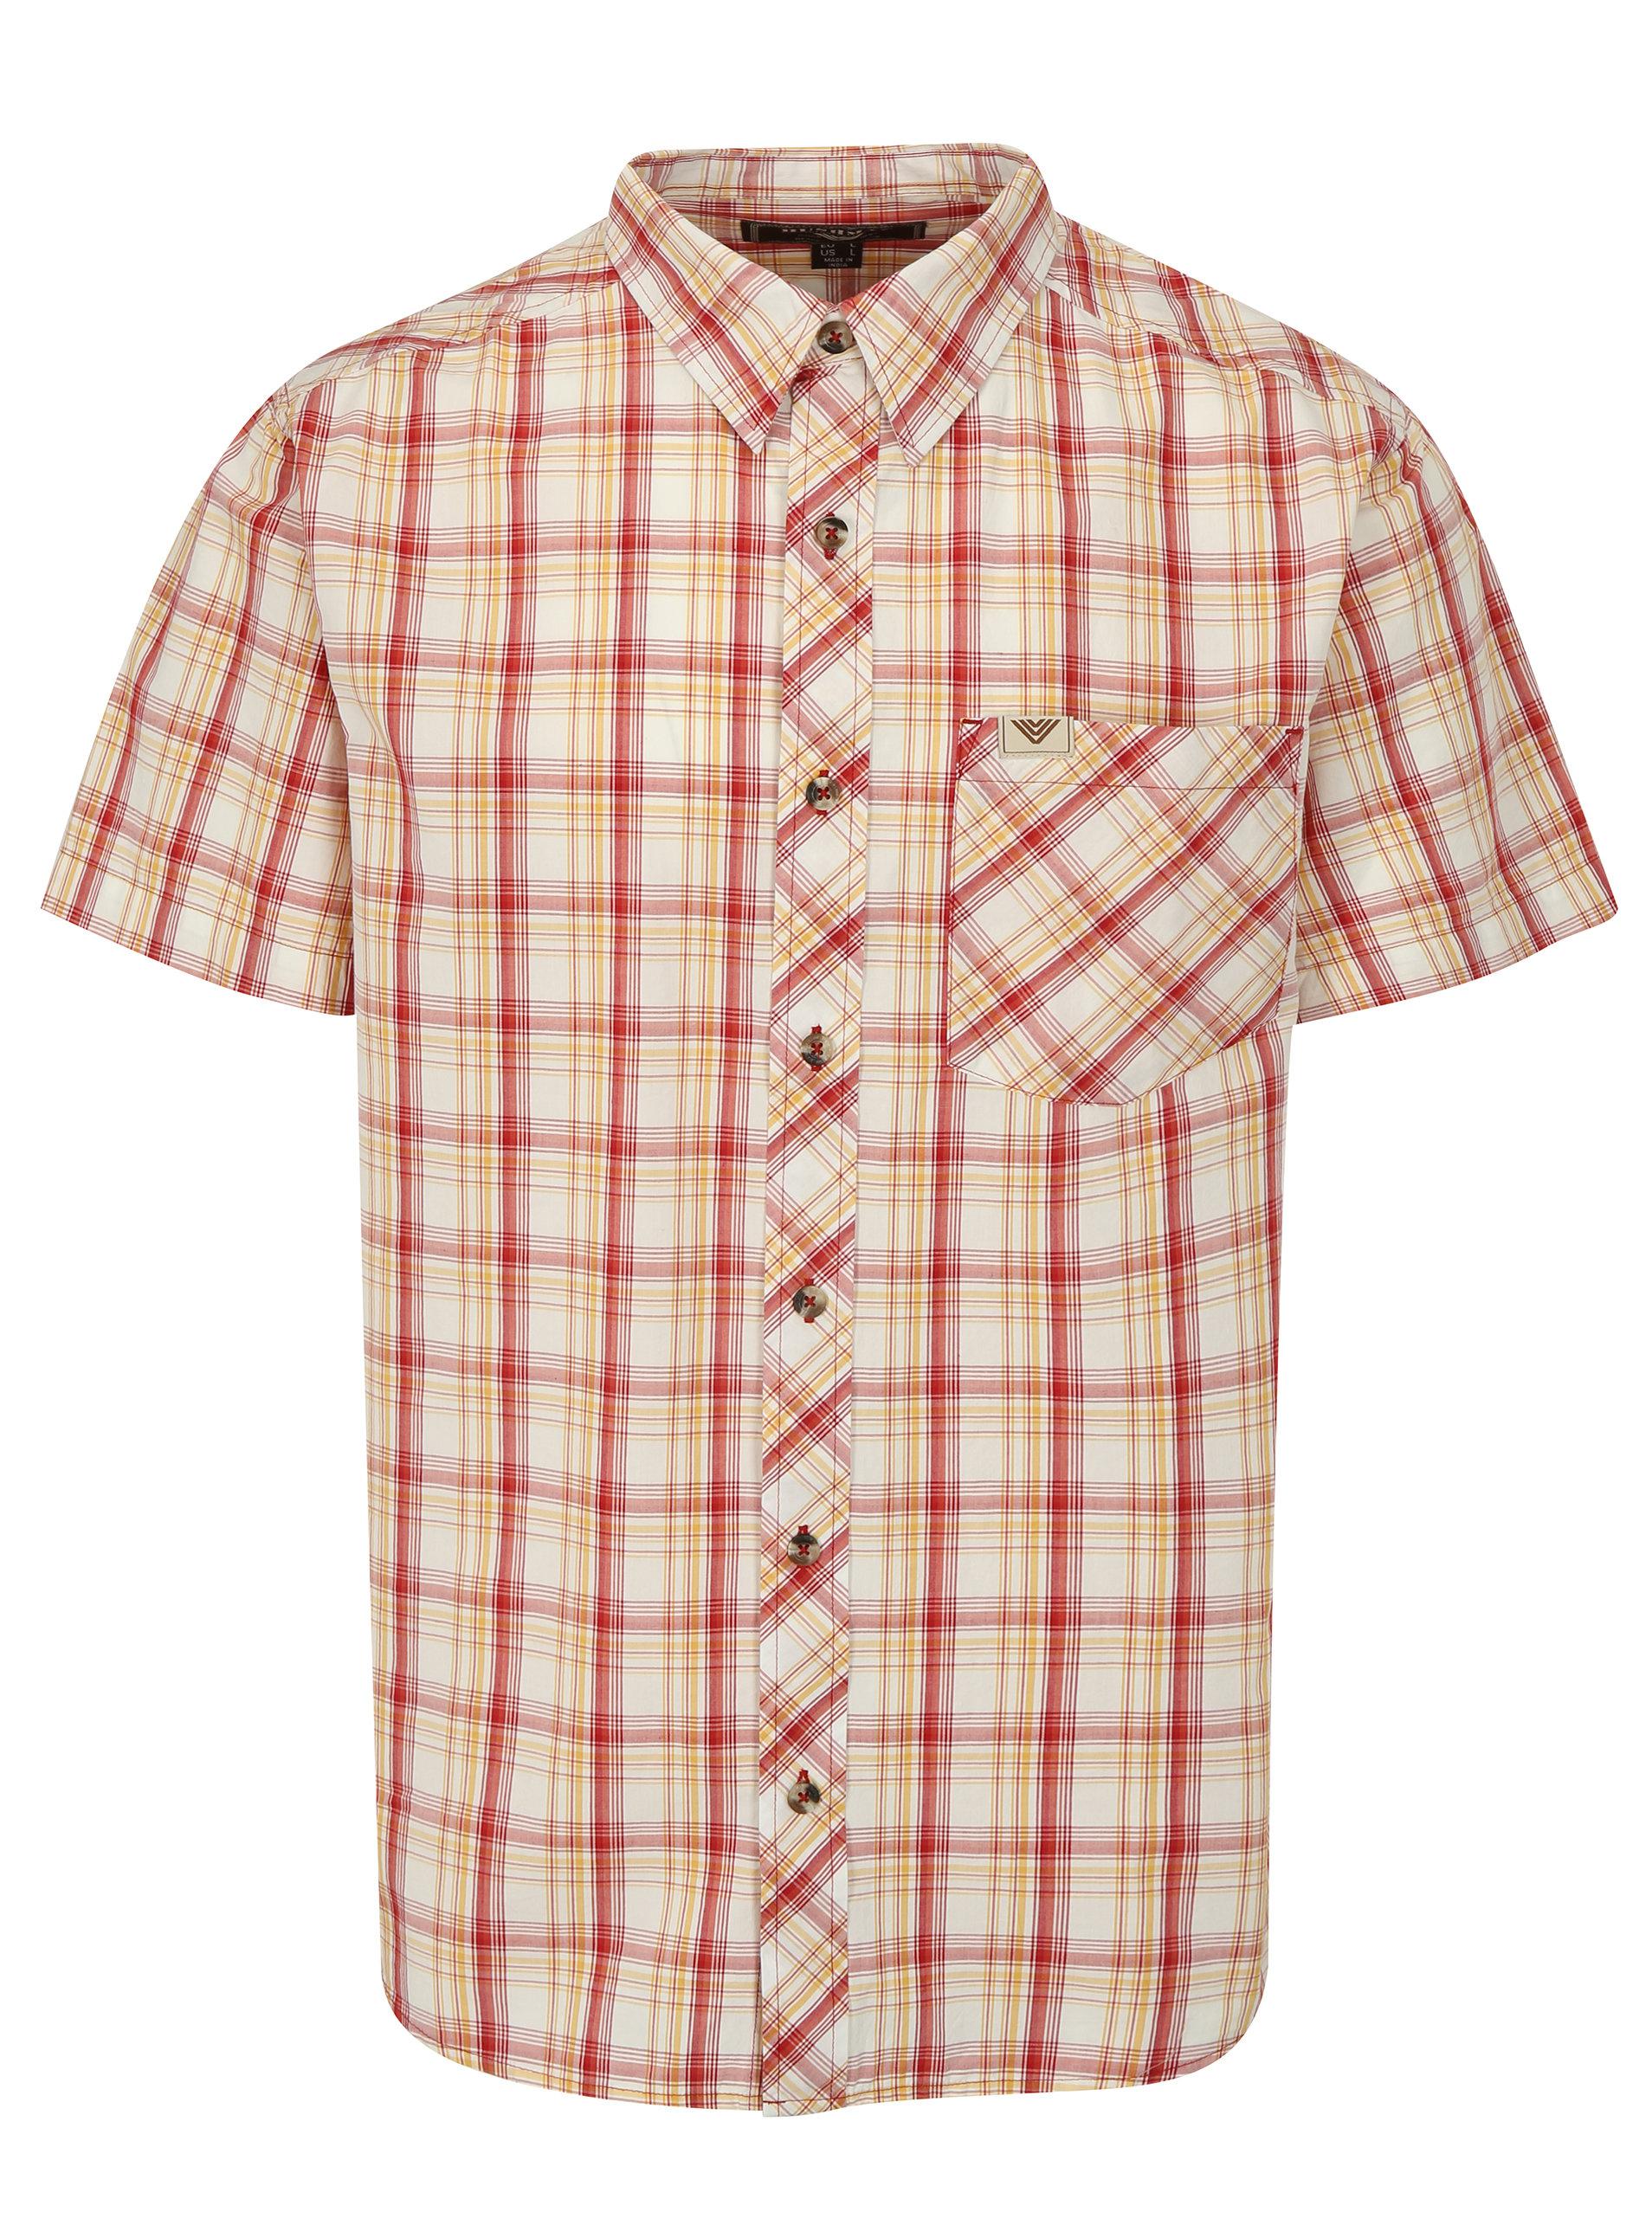 Červeno-žlutá pánská kostkovaná košile BUSHMAN Inez ... ce0b9a461f